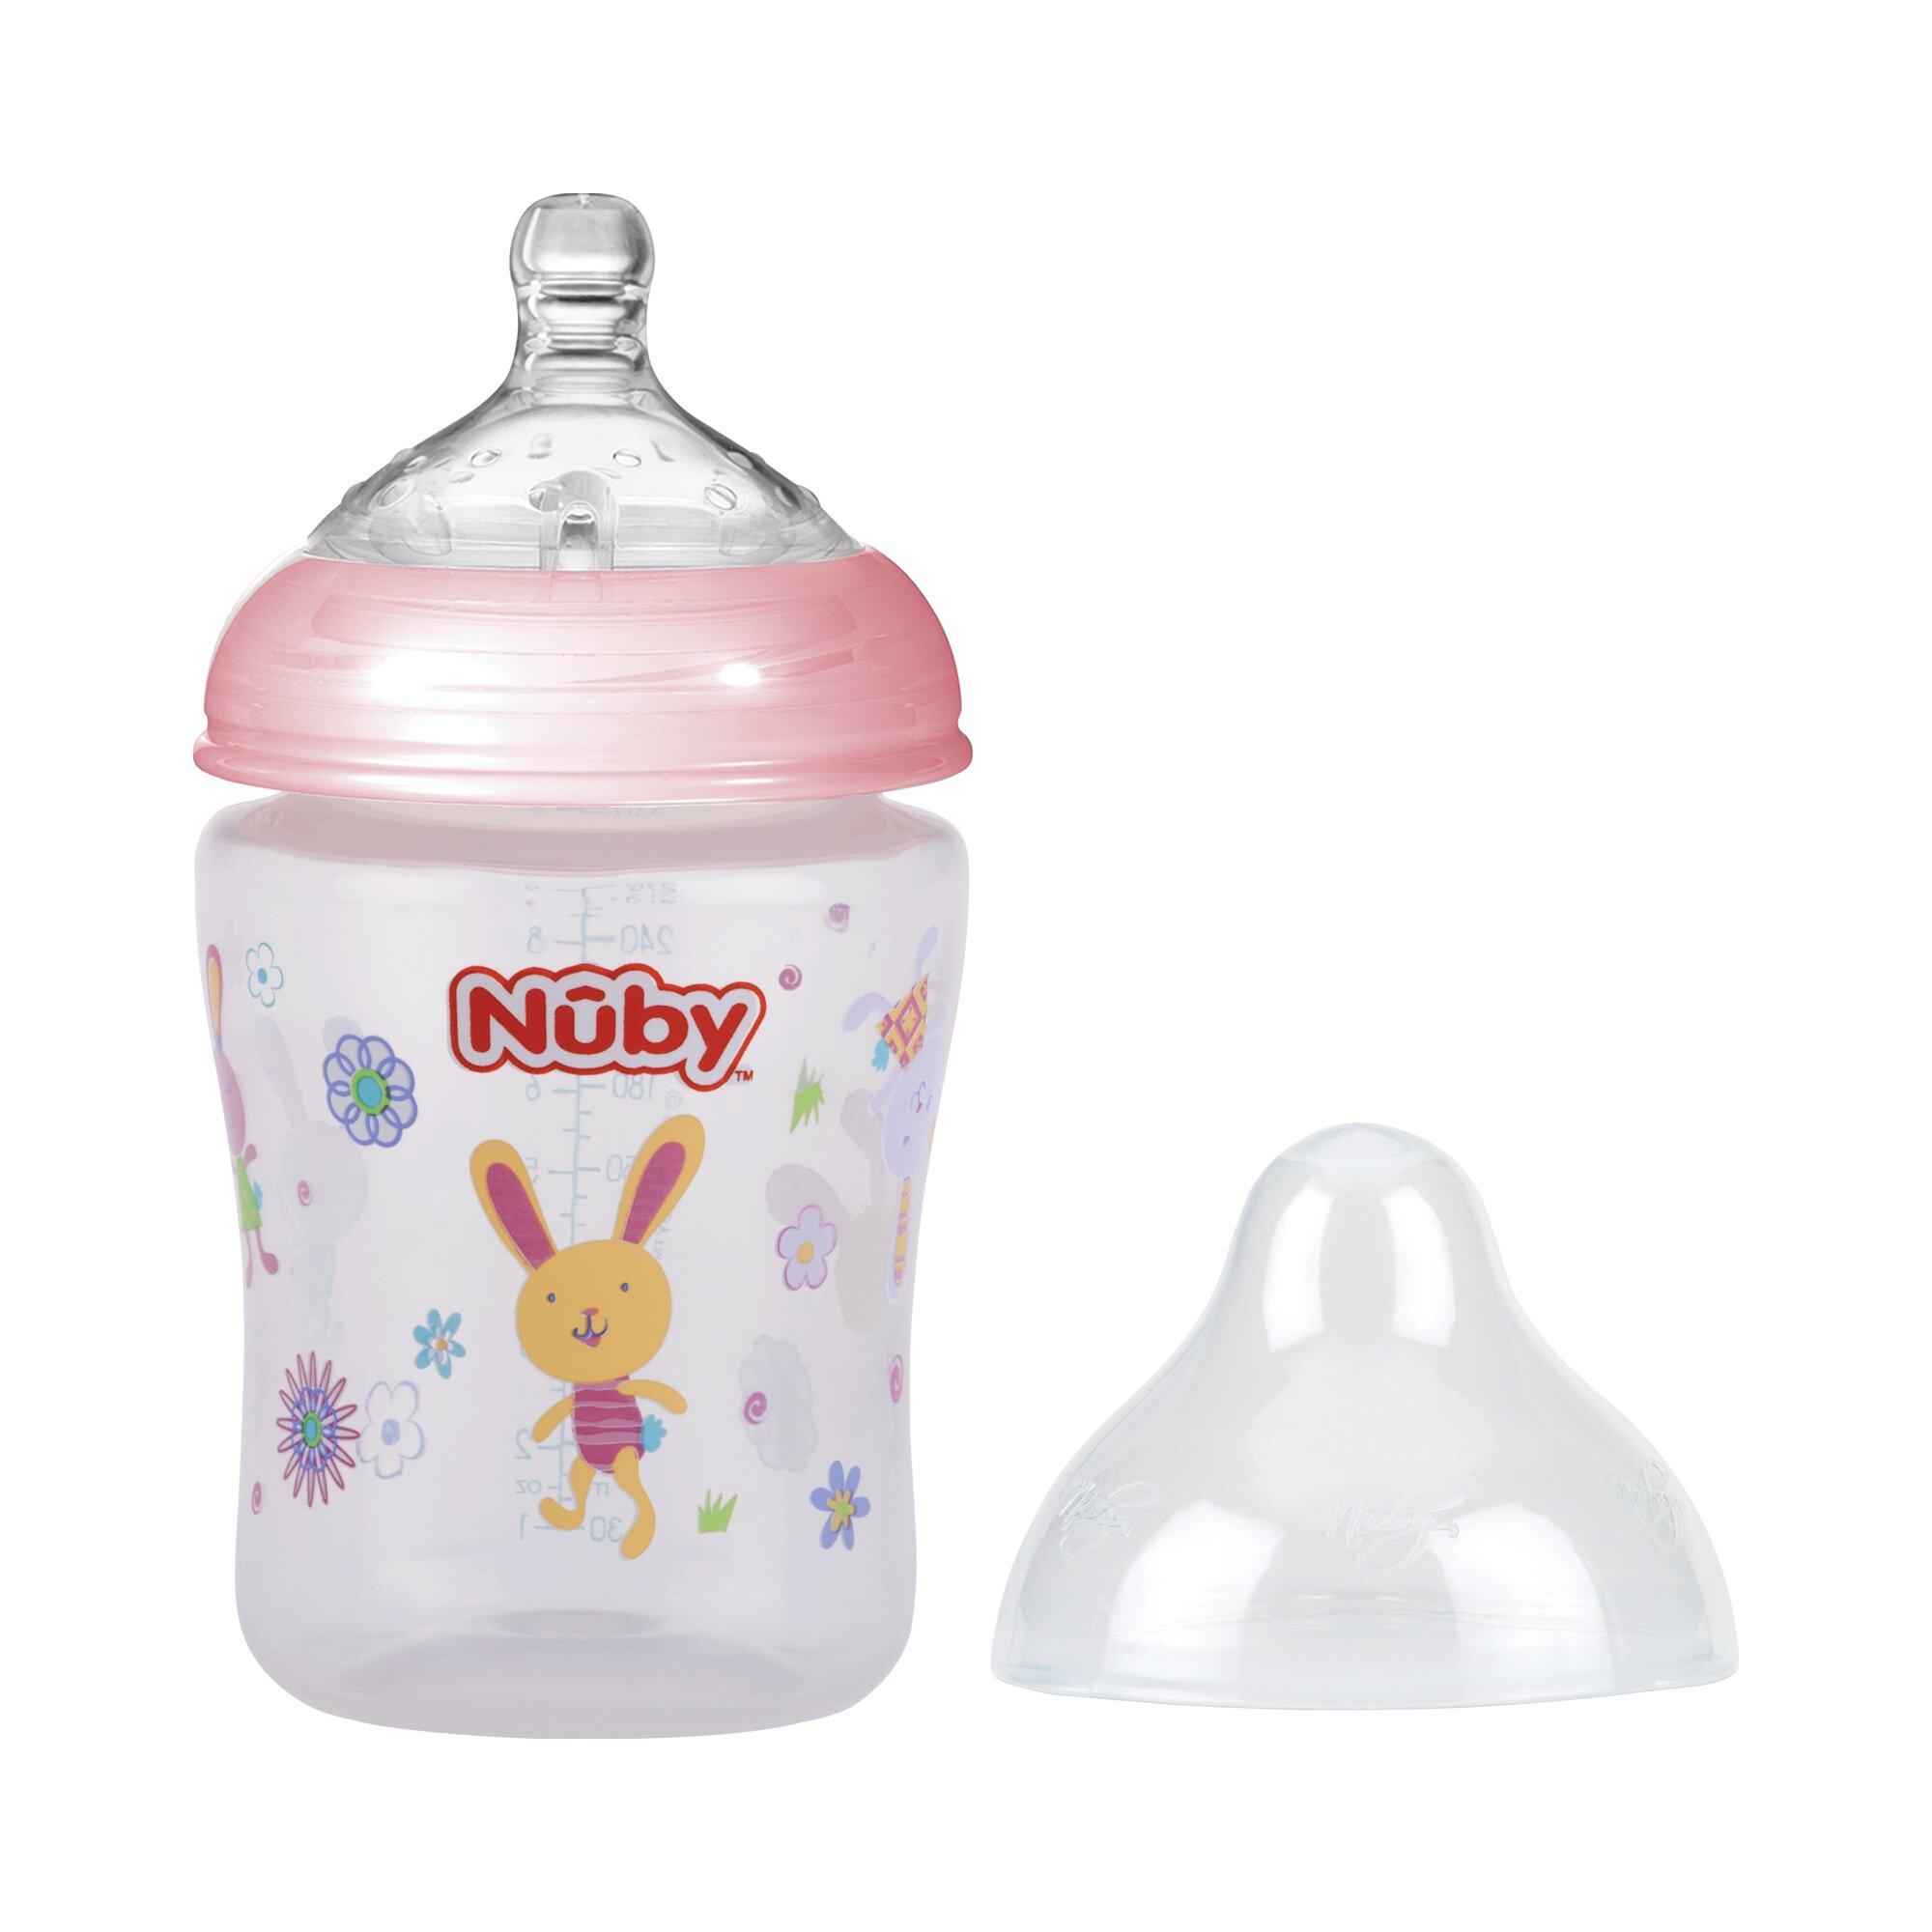 nuby-6-tlg-starter-set-xxml-ab-geburt